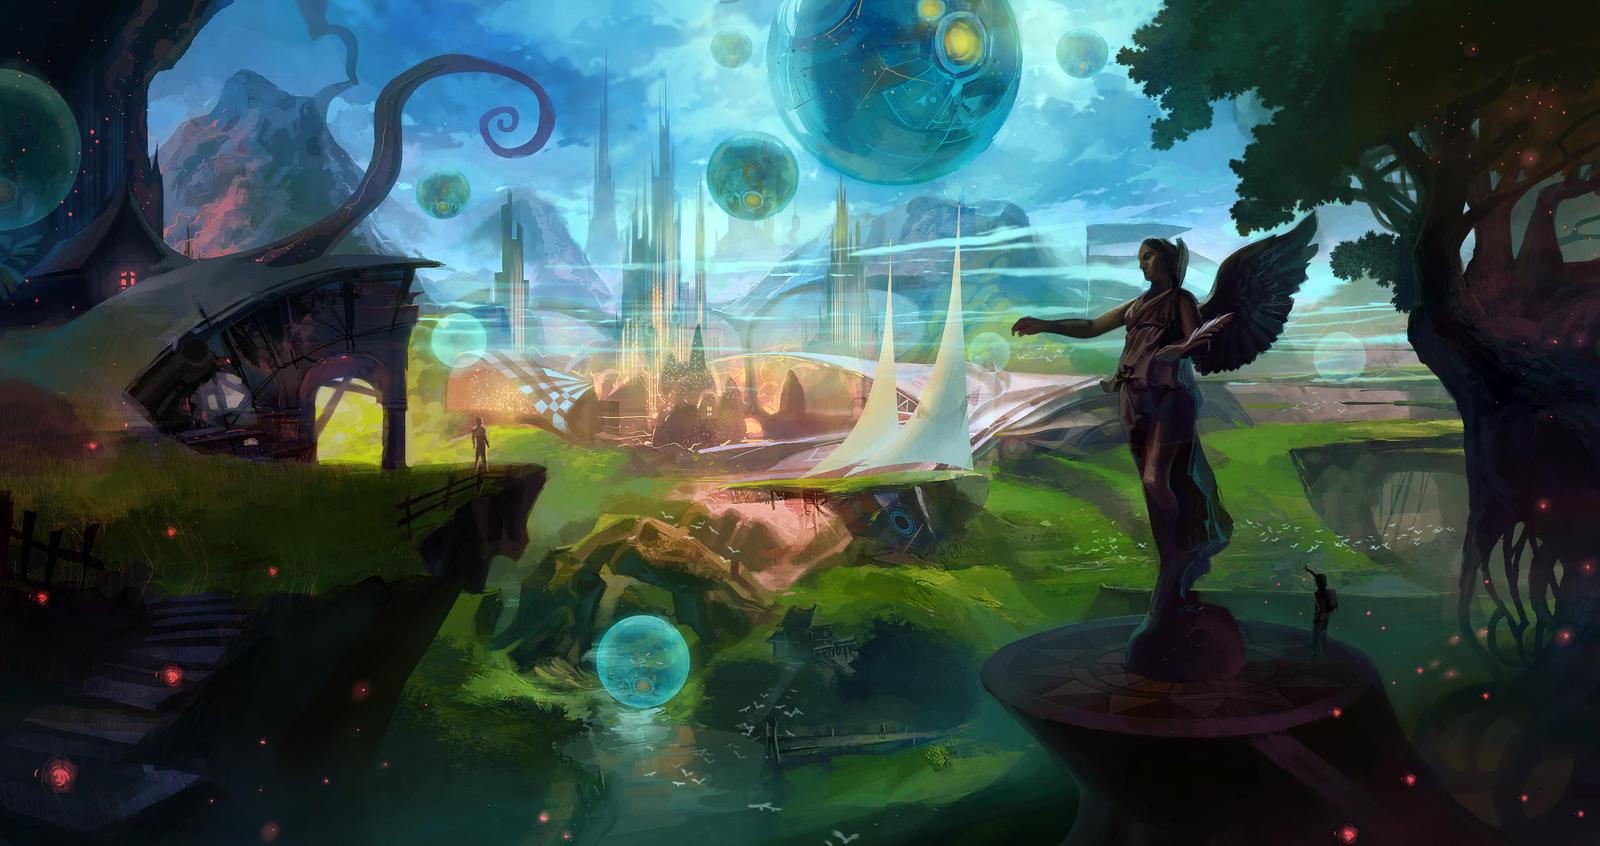 dreamscape by bonggo on deviantart